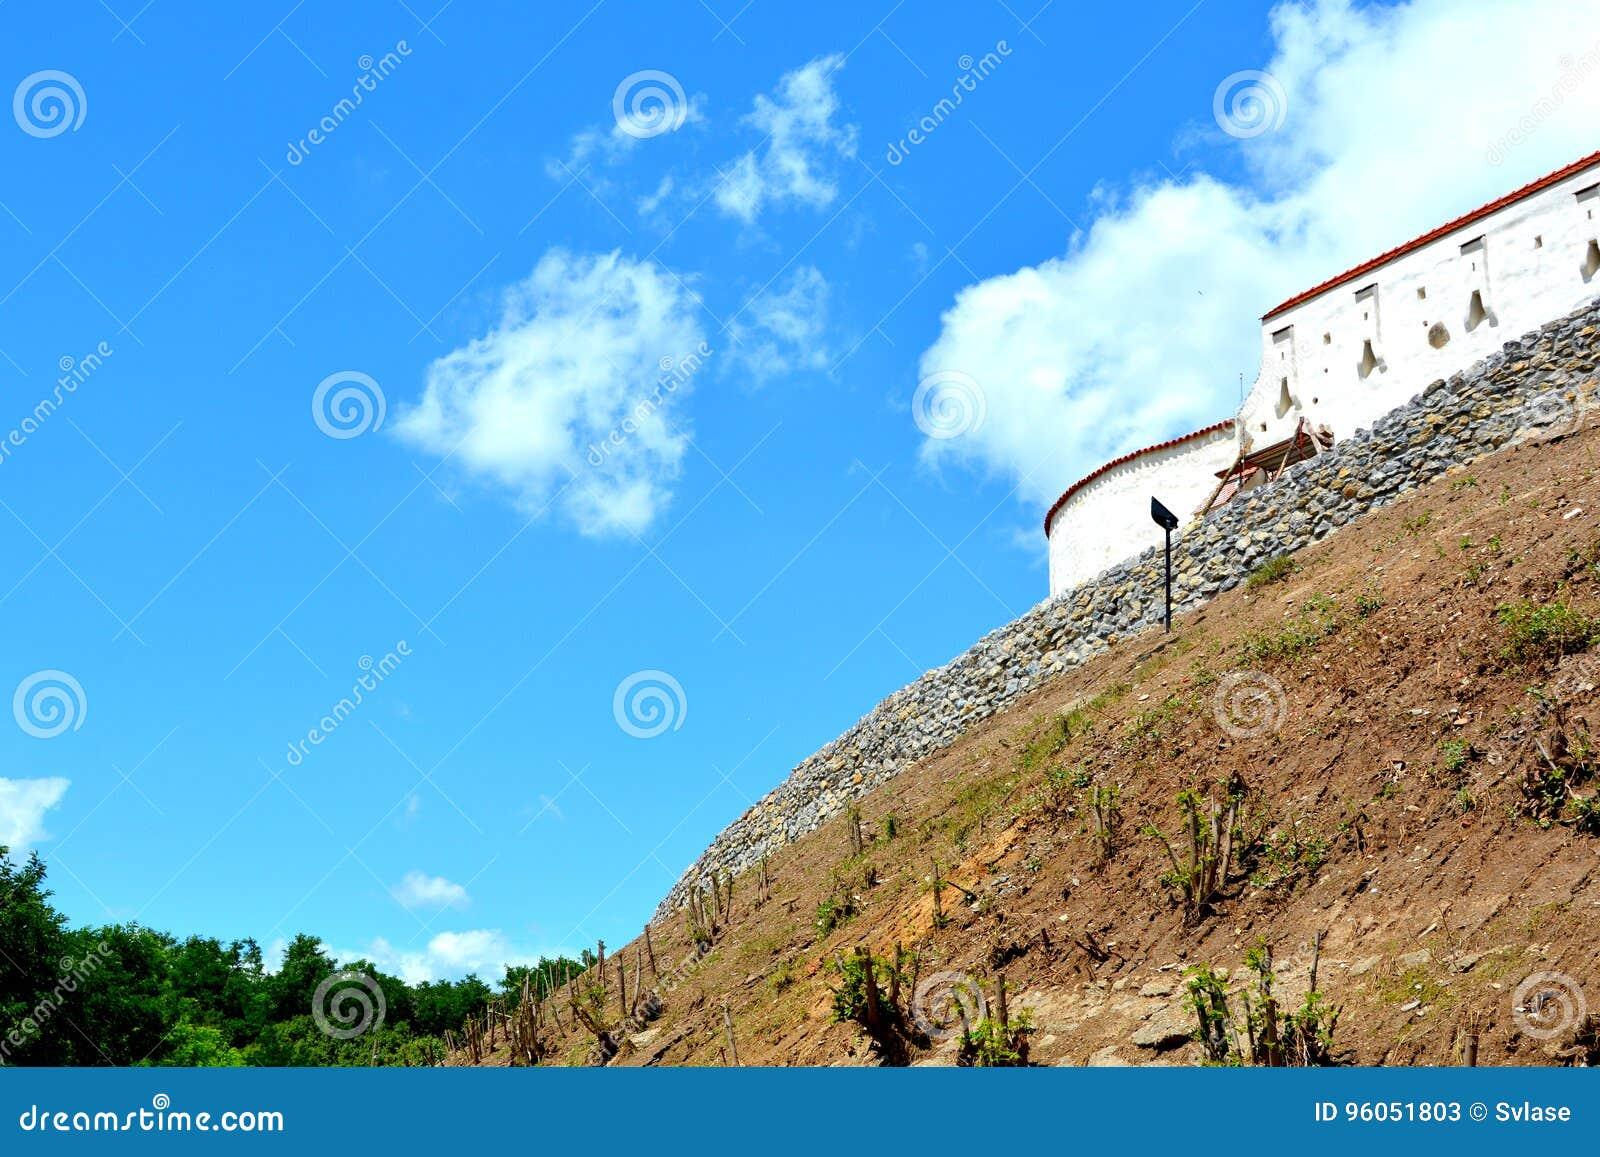 Église médiévale saxonne enrichie dans le village Feldioara, la Transylvanie